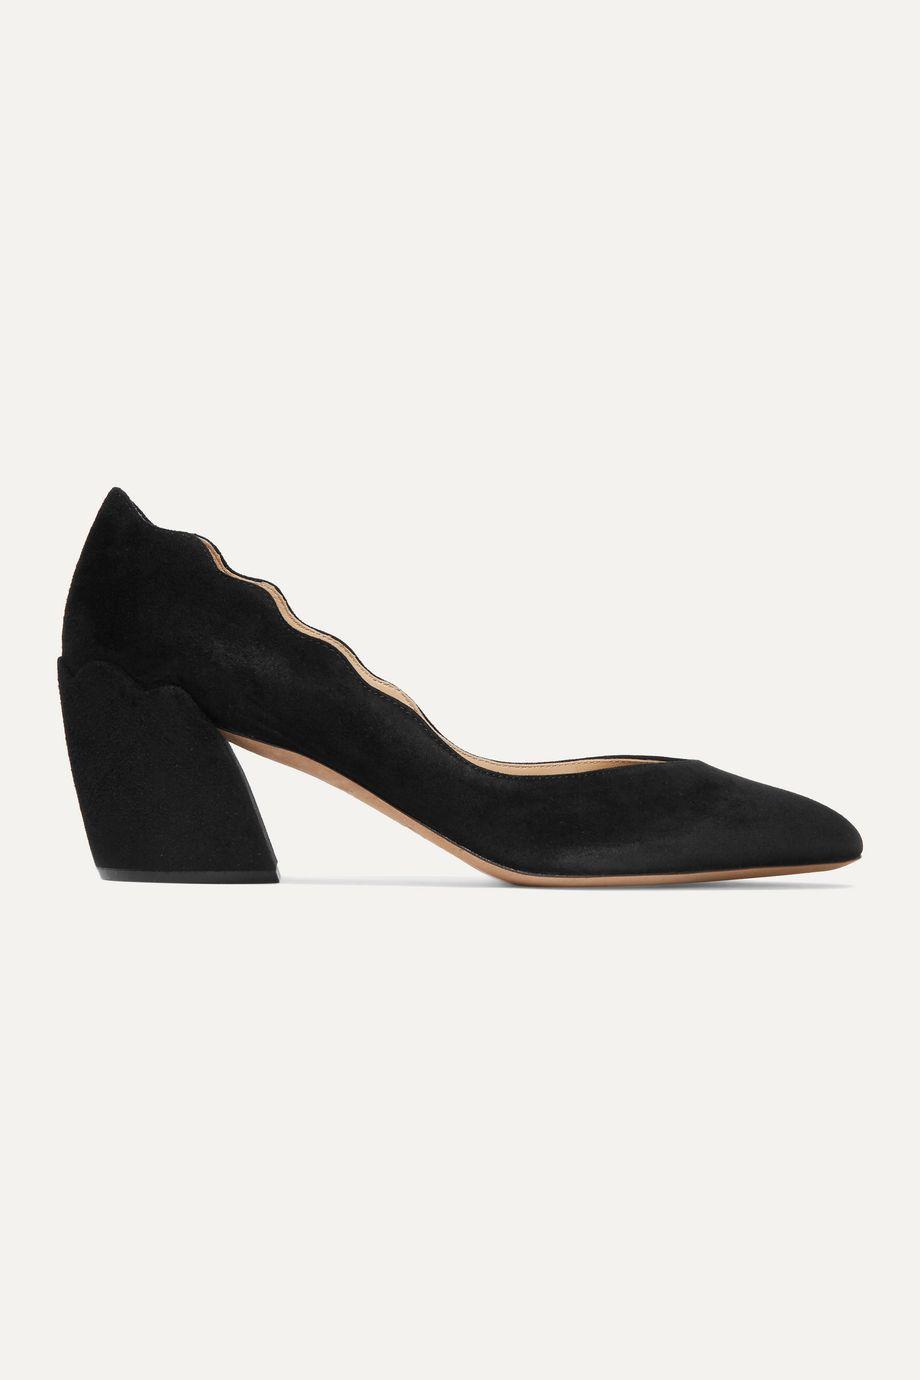 Chloé Laurena 扇贝边绒面革中跟鞋